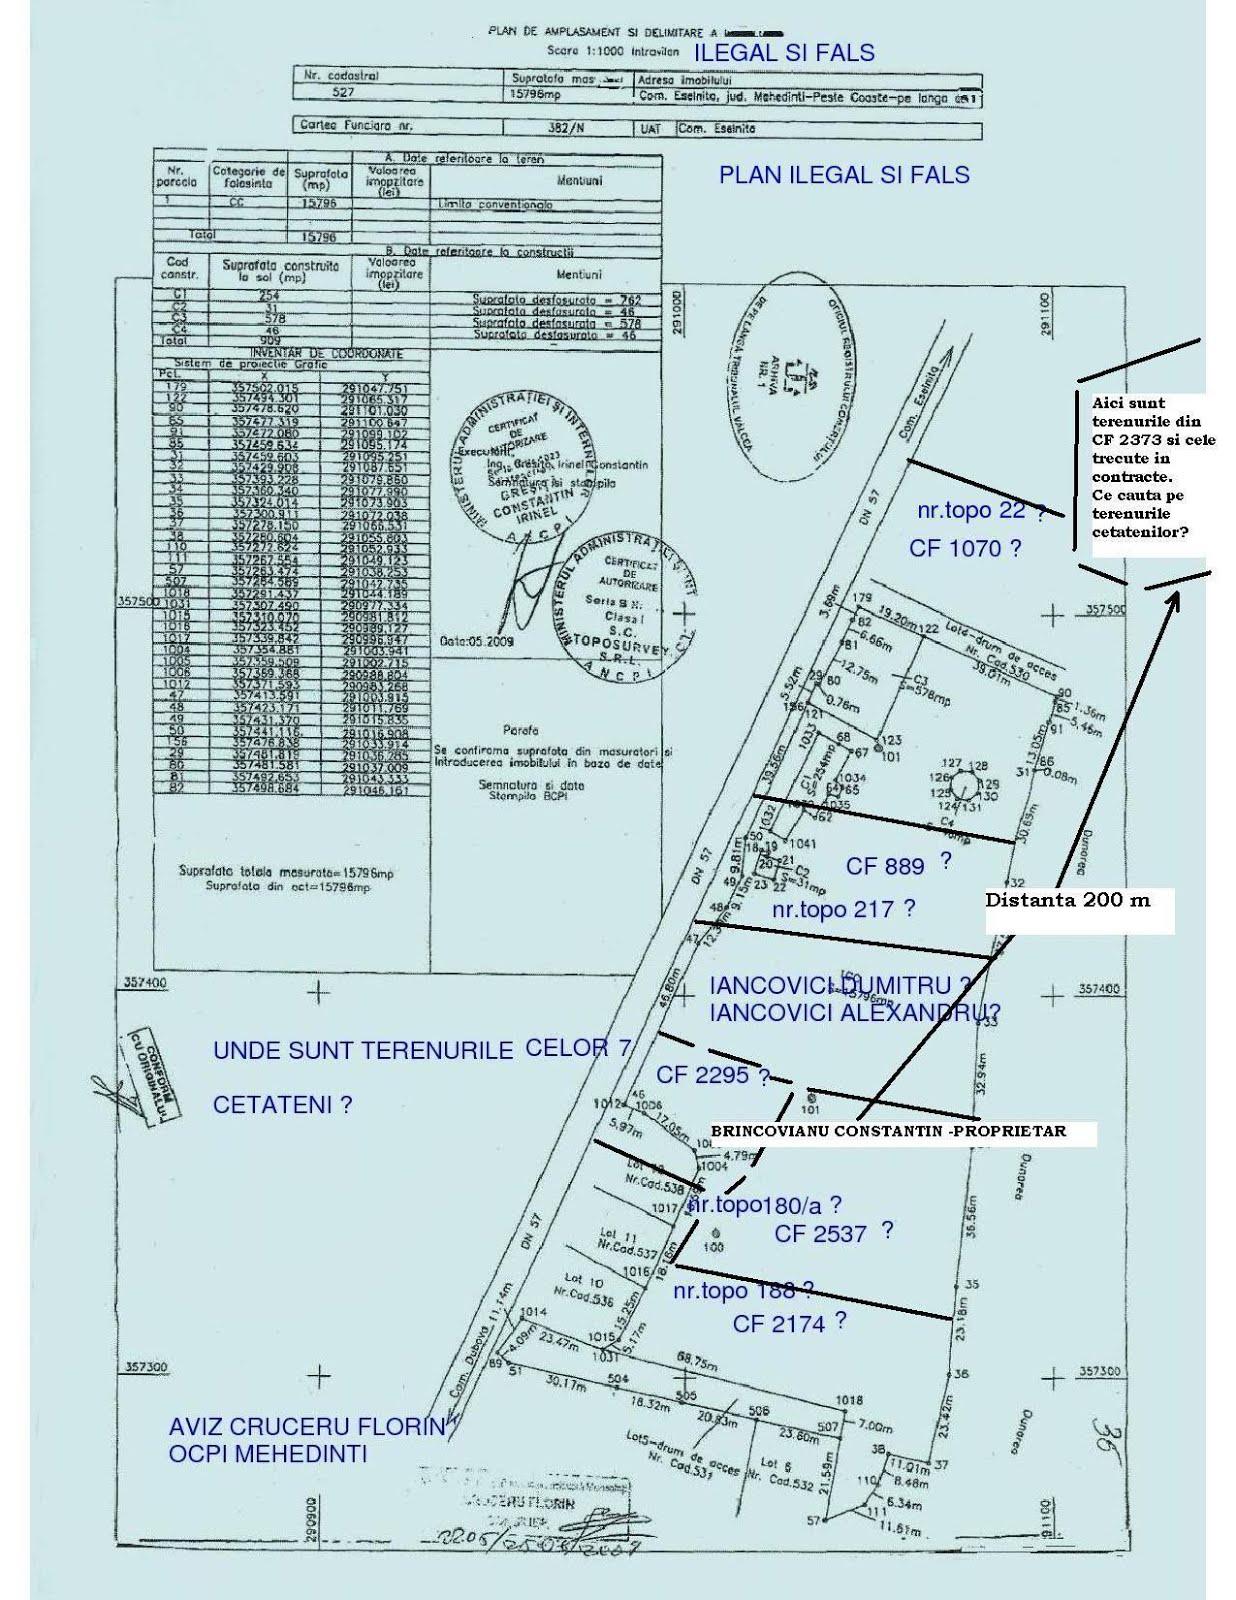 2.Avizul nr.2205  din 25.06.2009 - al OCPI Mehedinti - FALS SI ILEGAL